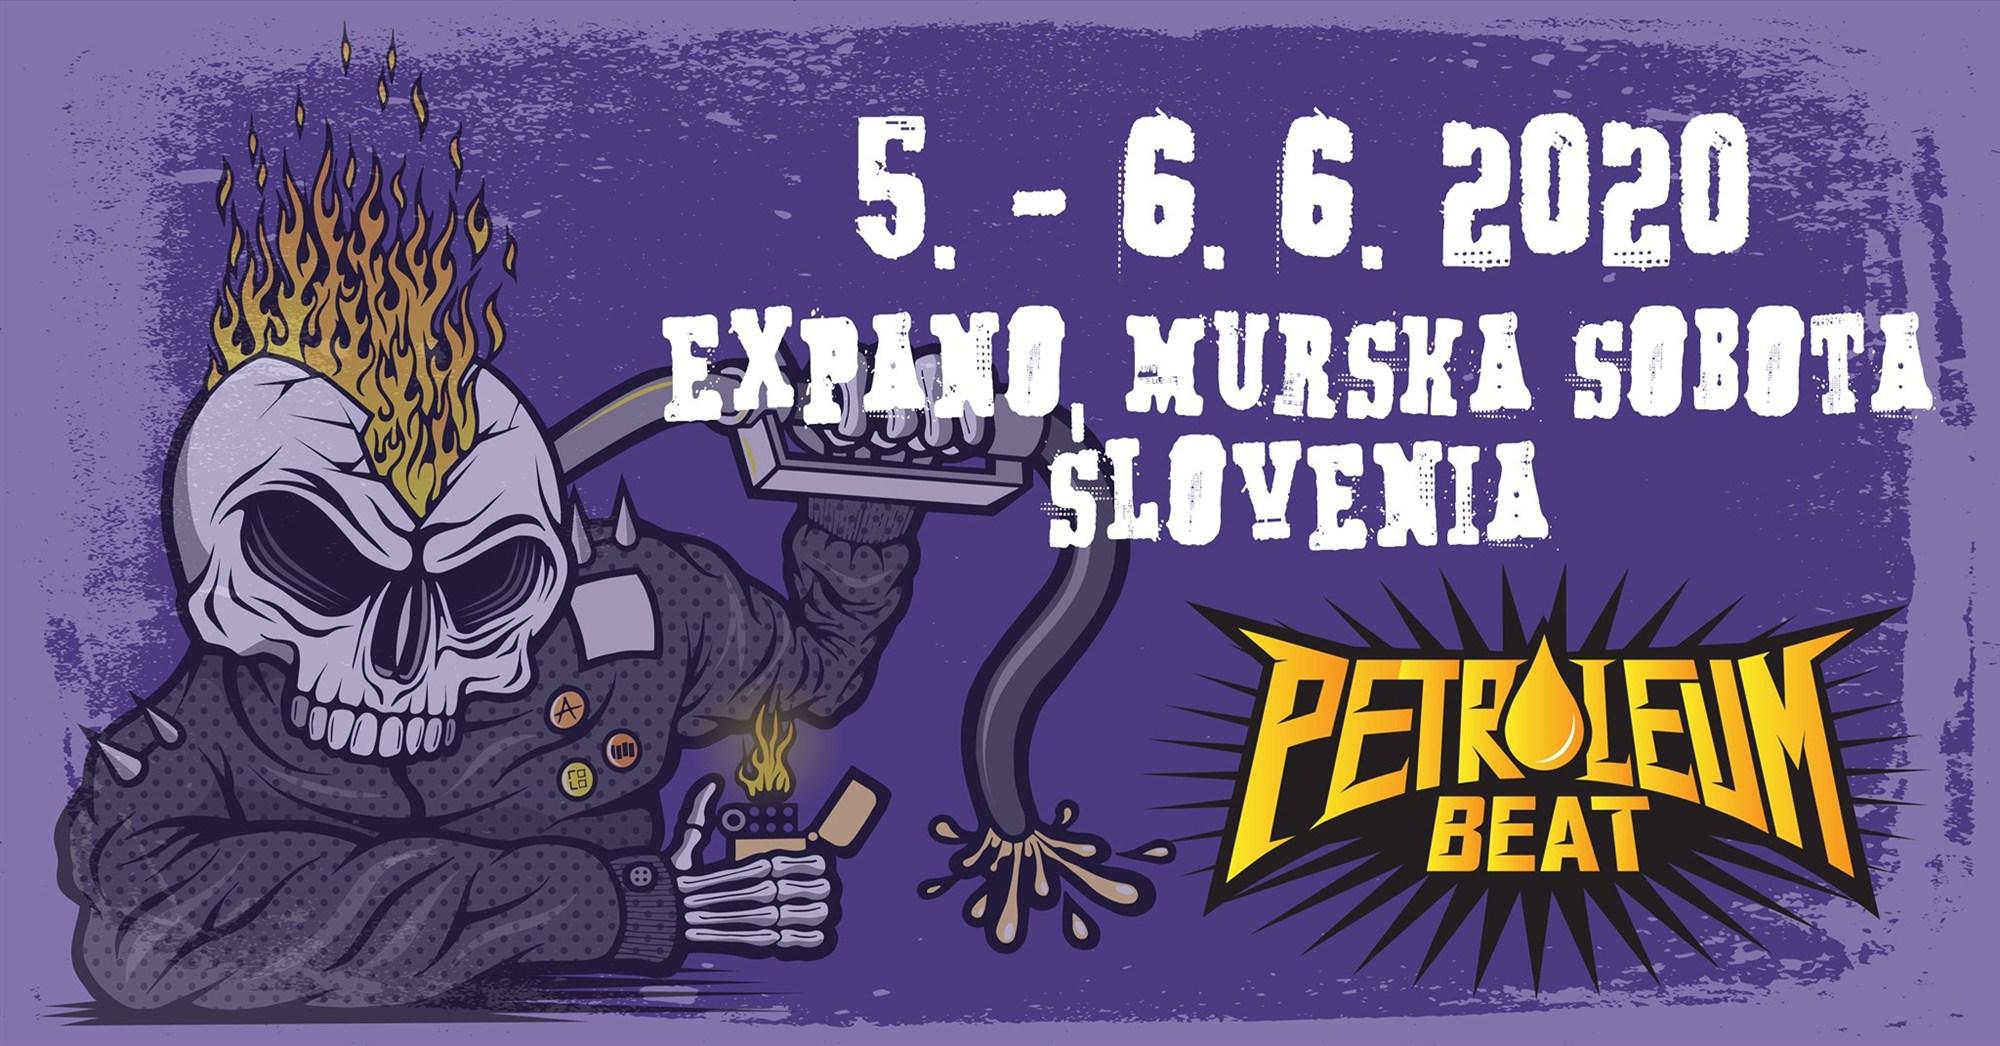 Petroleum BEAT Festival - Lendava